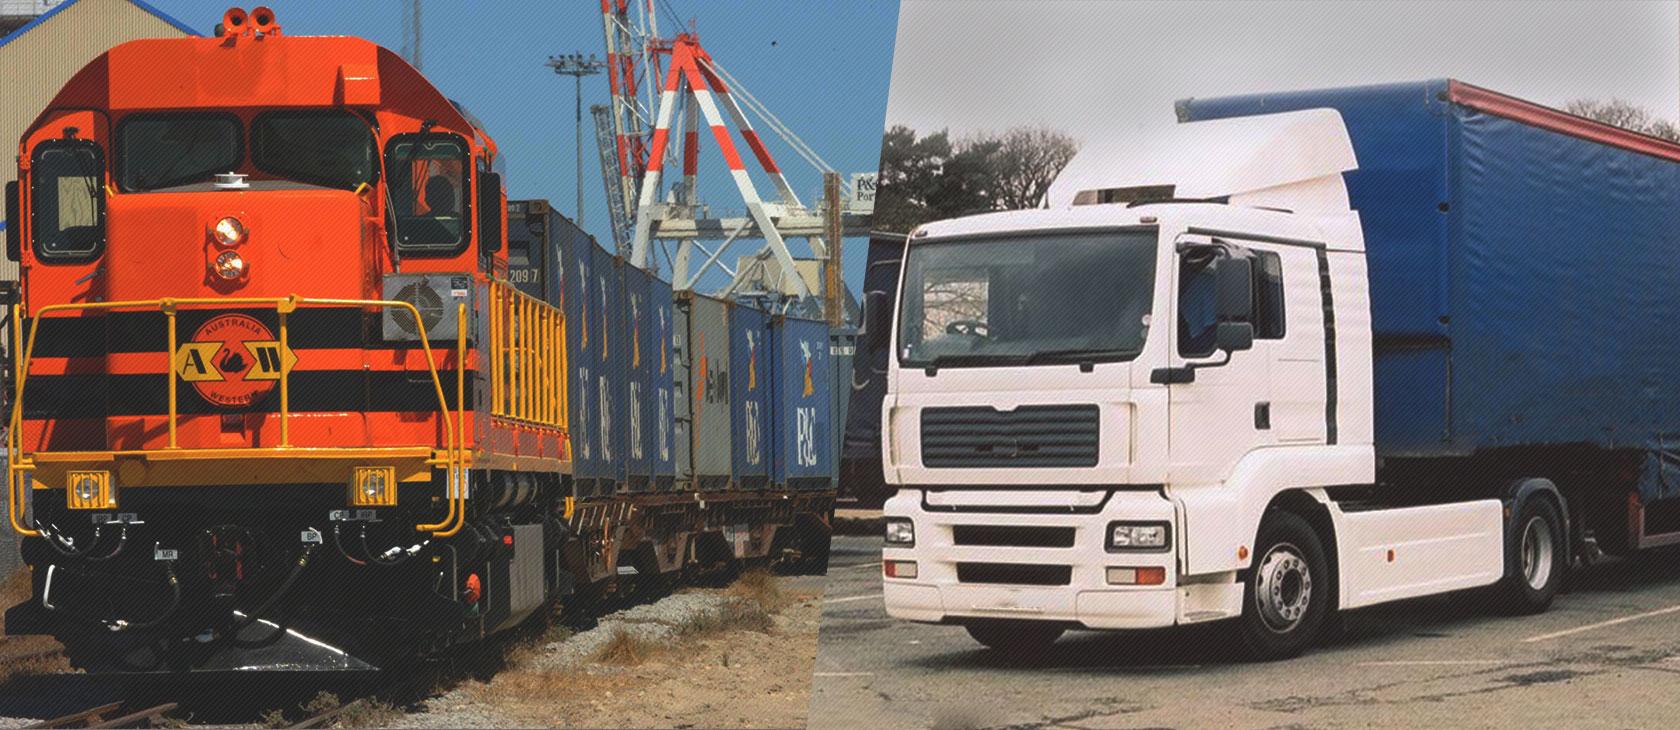 Deepak Transexprress   Road Transport   Supply Chain